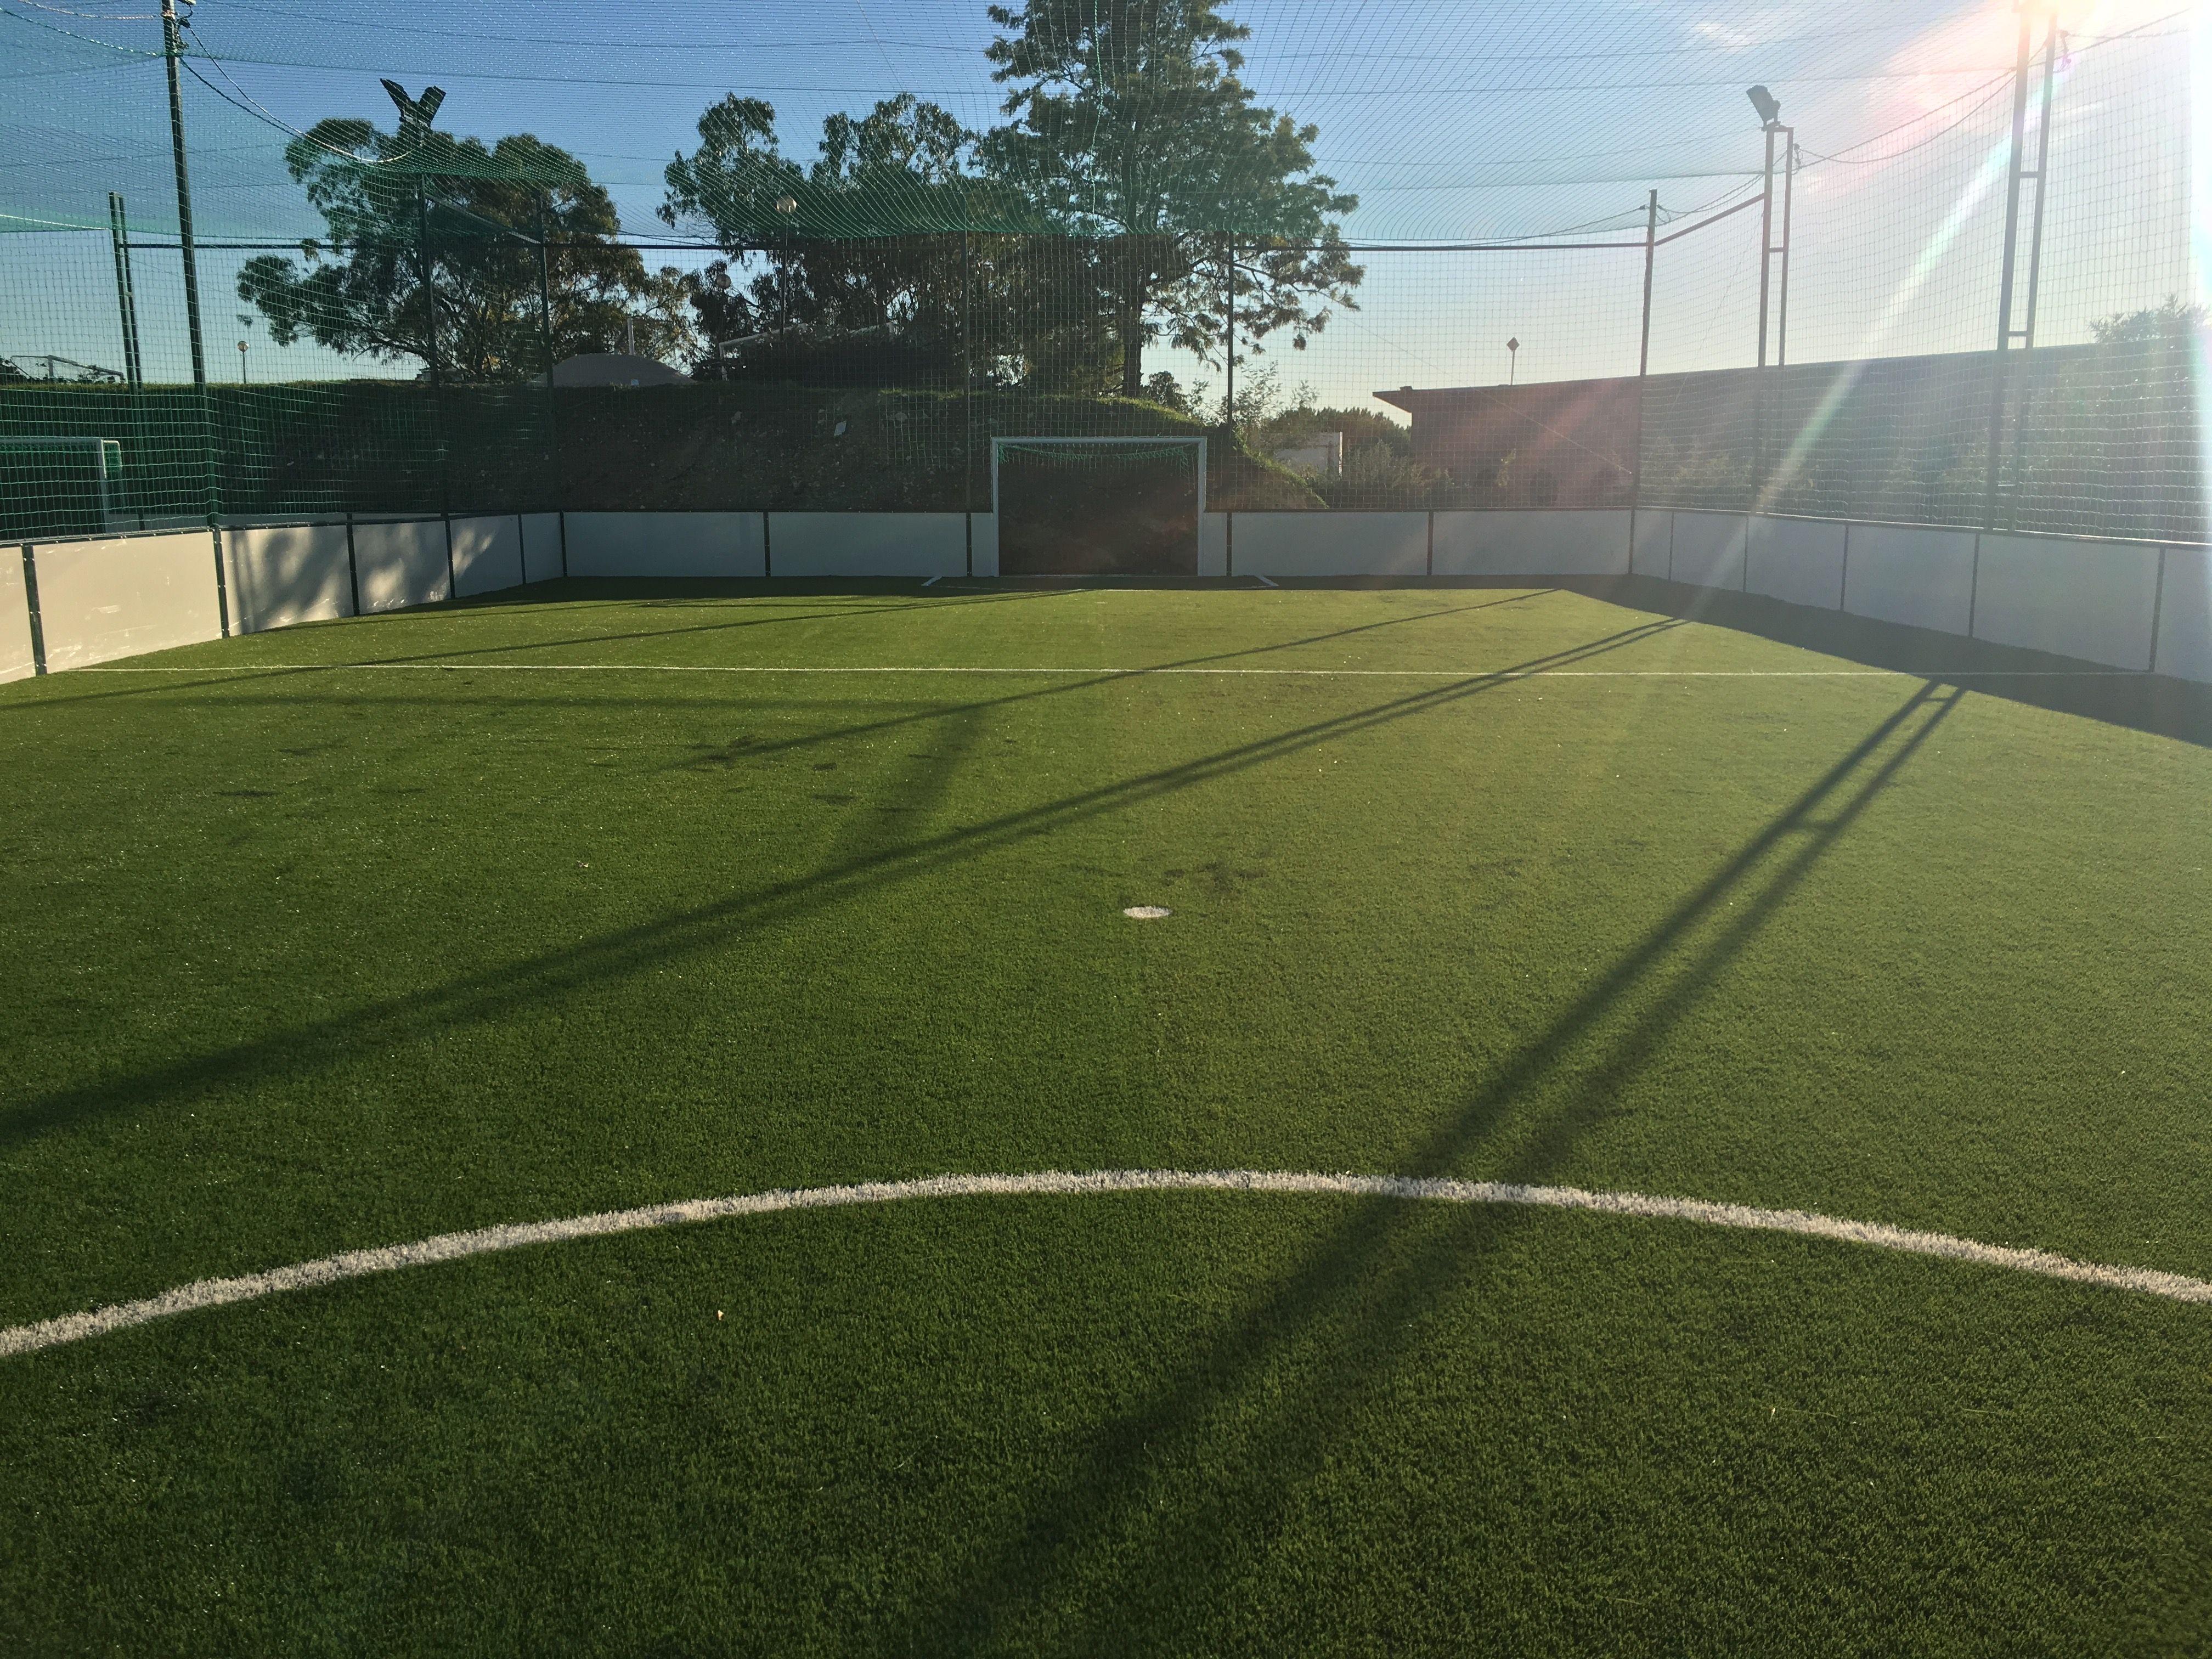 Hamilton Ymca Event At Finley Stadium 7 17 14 Soccer Field Photo Ymca